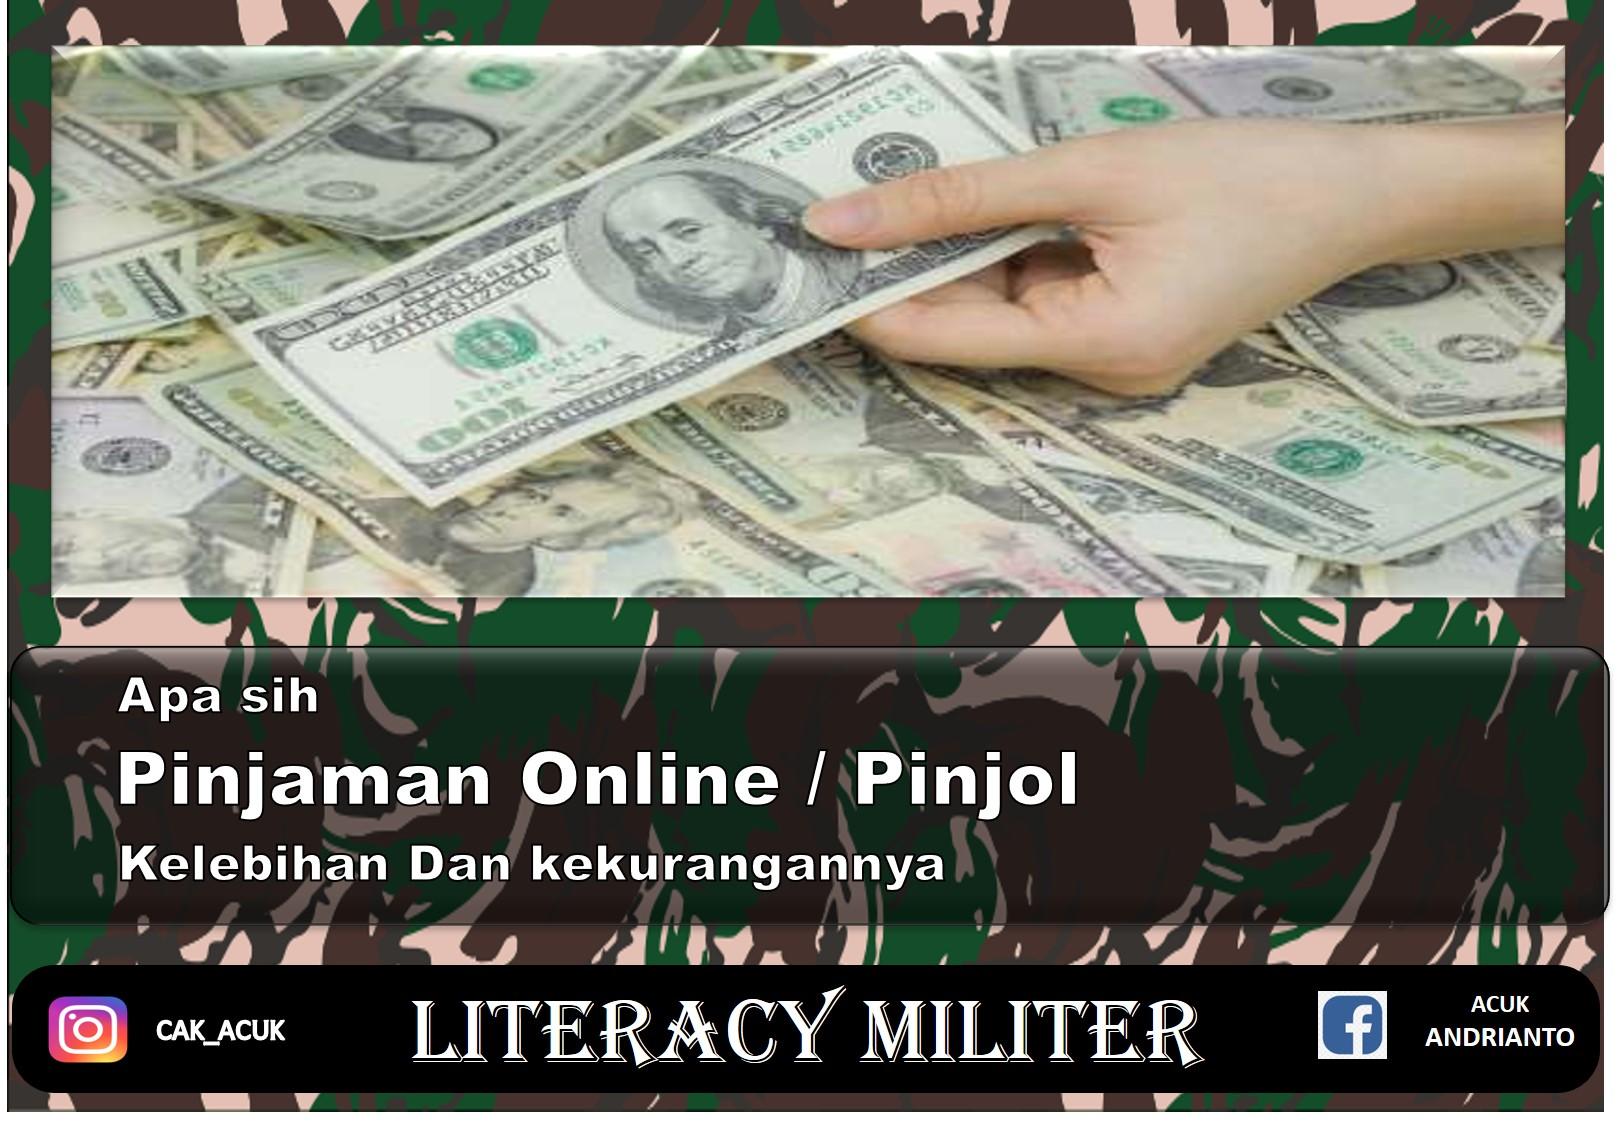 pinjaman online / pinjol